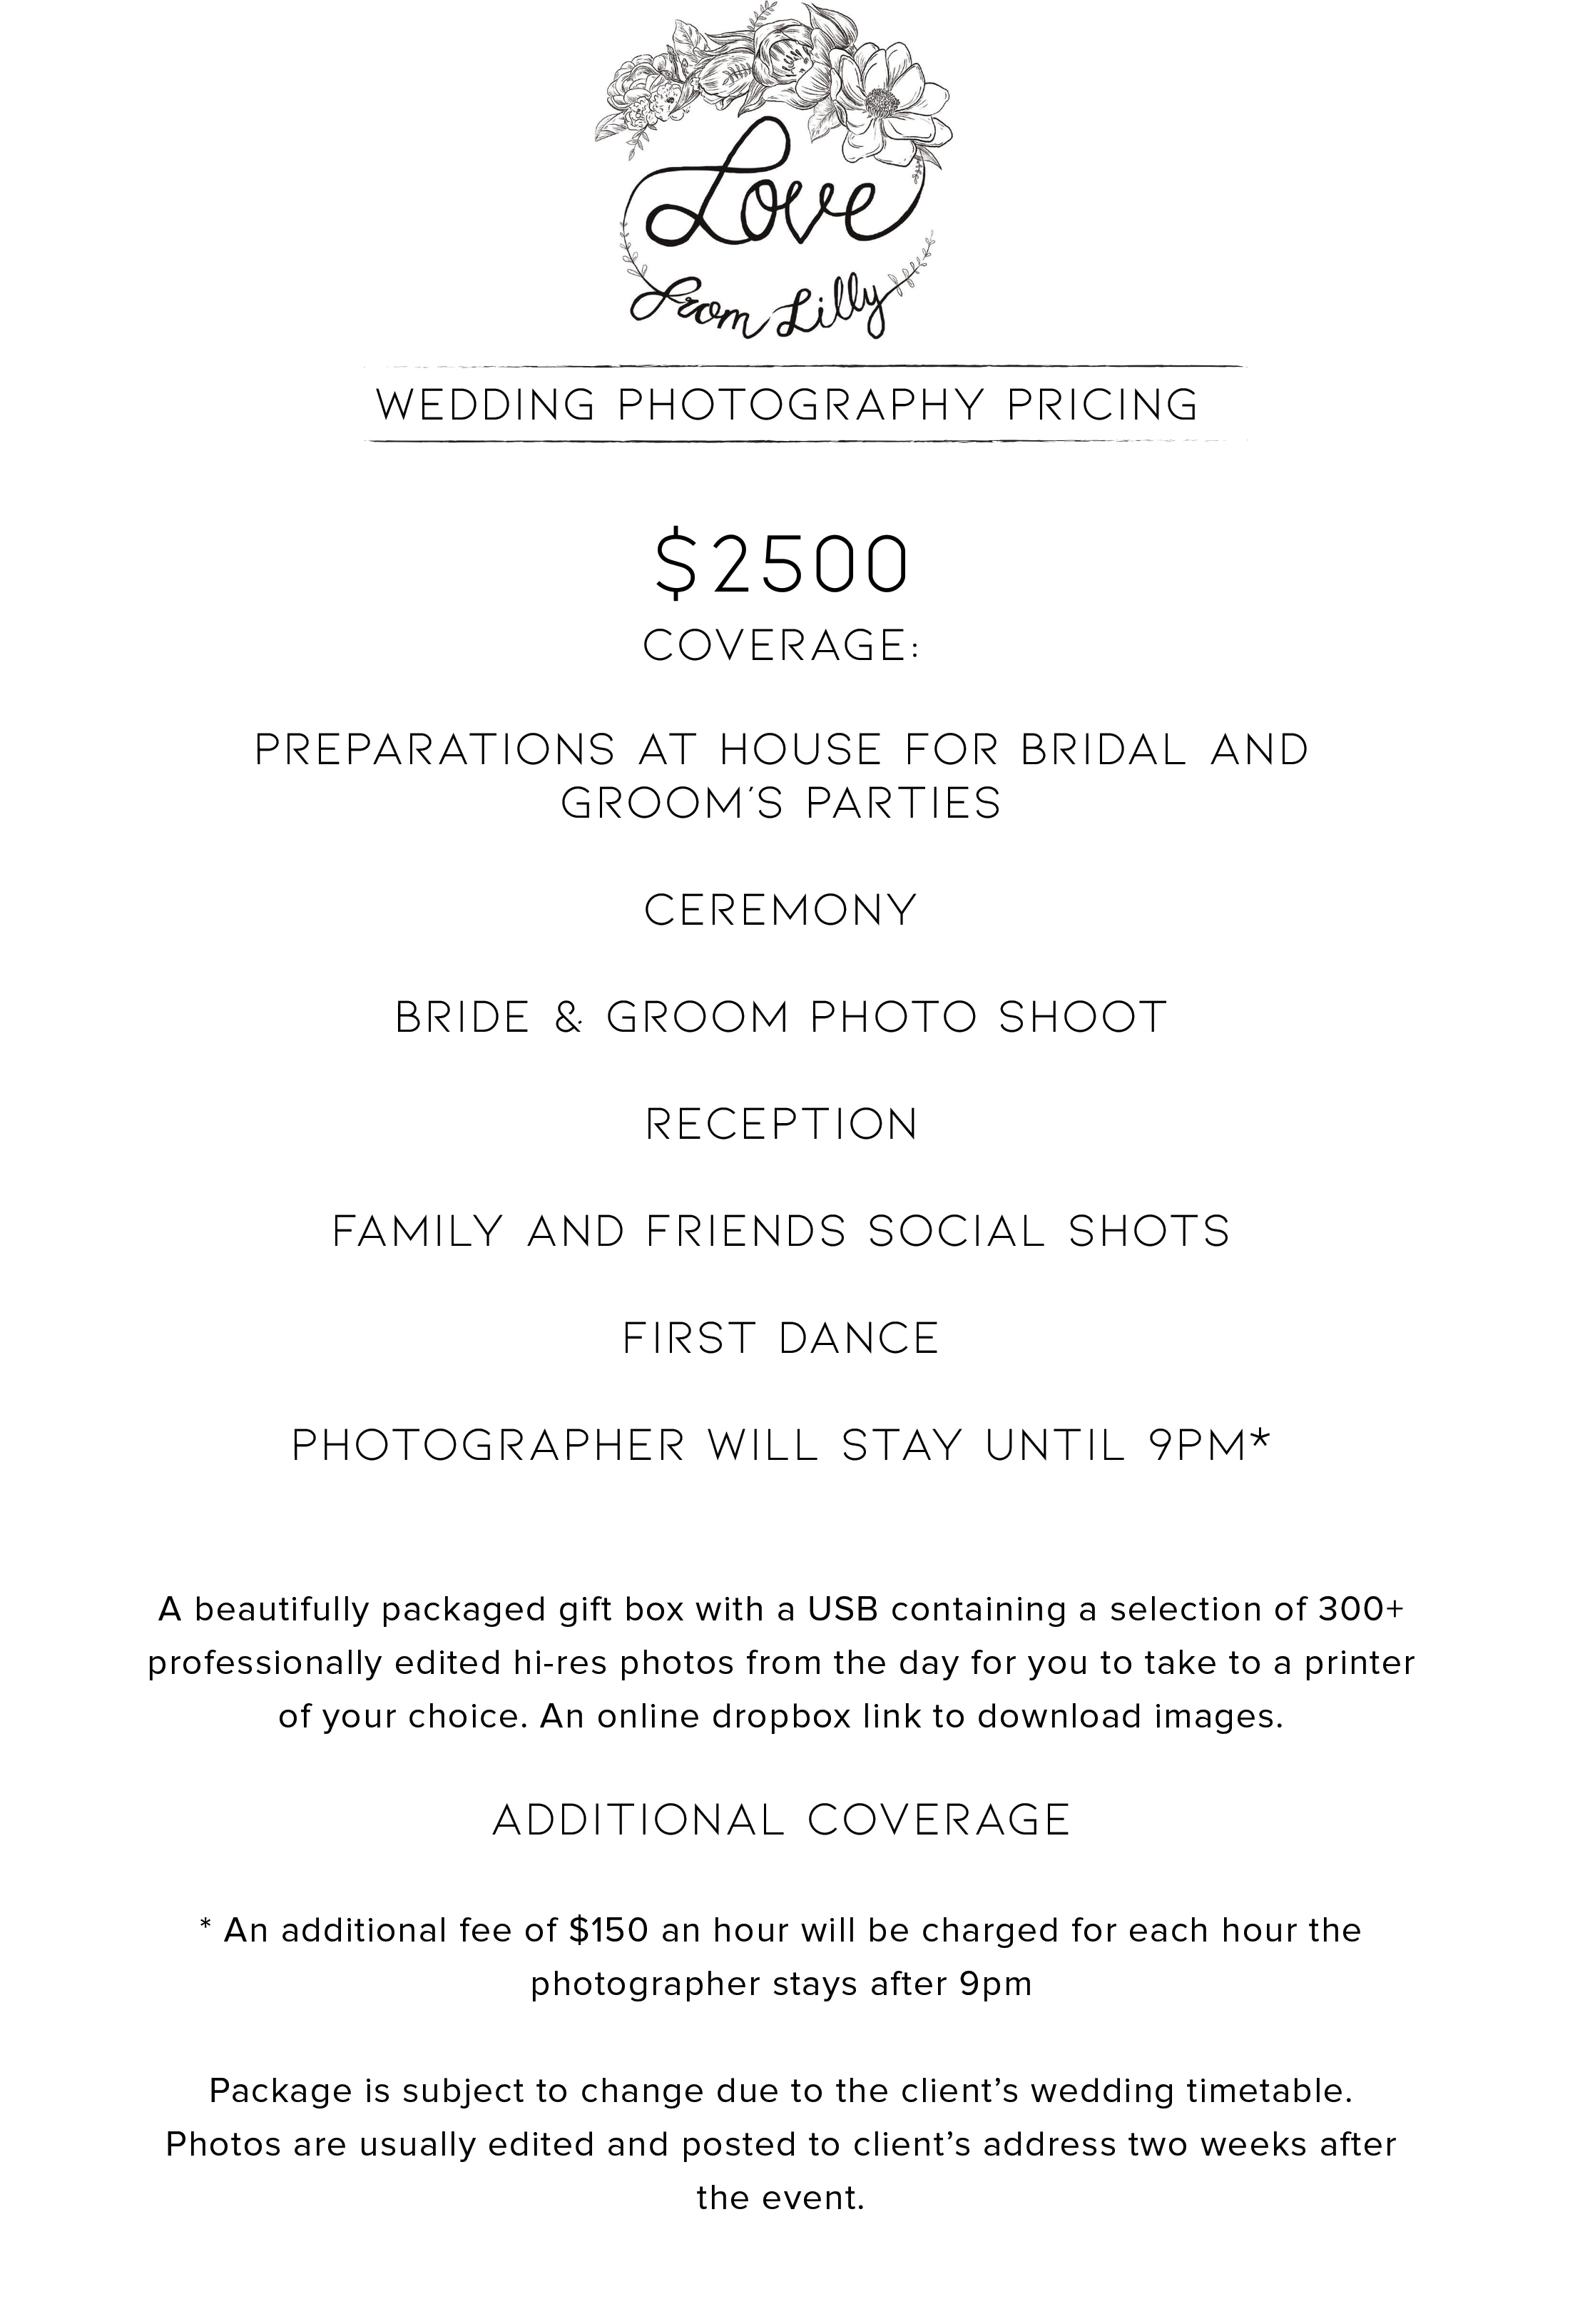 Love-From-Lilly-wedding-Price-Sheet-(1)-1.jpg